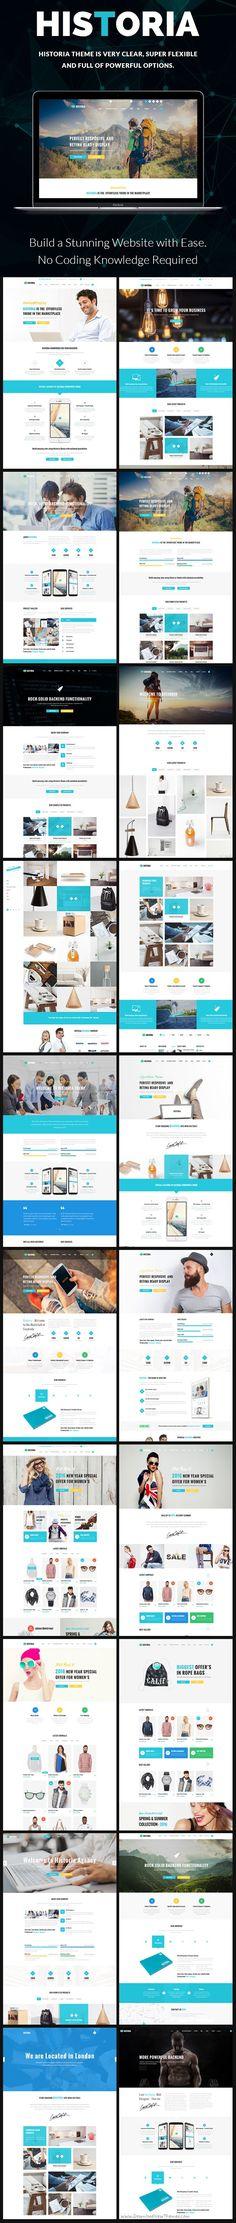 Historia is beautifully design versatile @WordPress #theme for stunning #startups #website with multipurpose 20+ homepage layouts download now➩ https://themeforest.net/item/historia-responsive-multipurpose-wordpress-theme/16854647?ref=Datasata